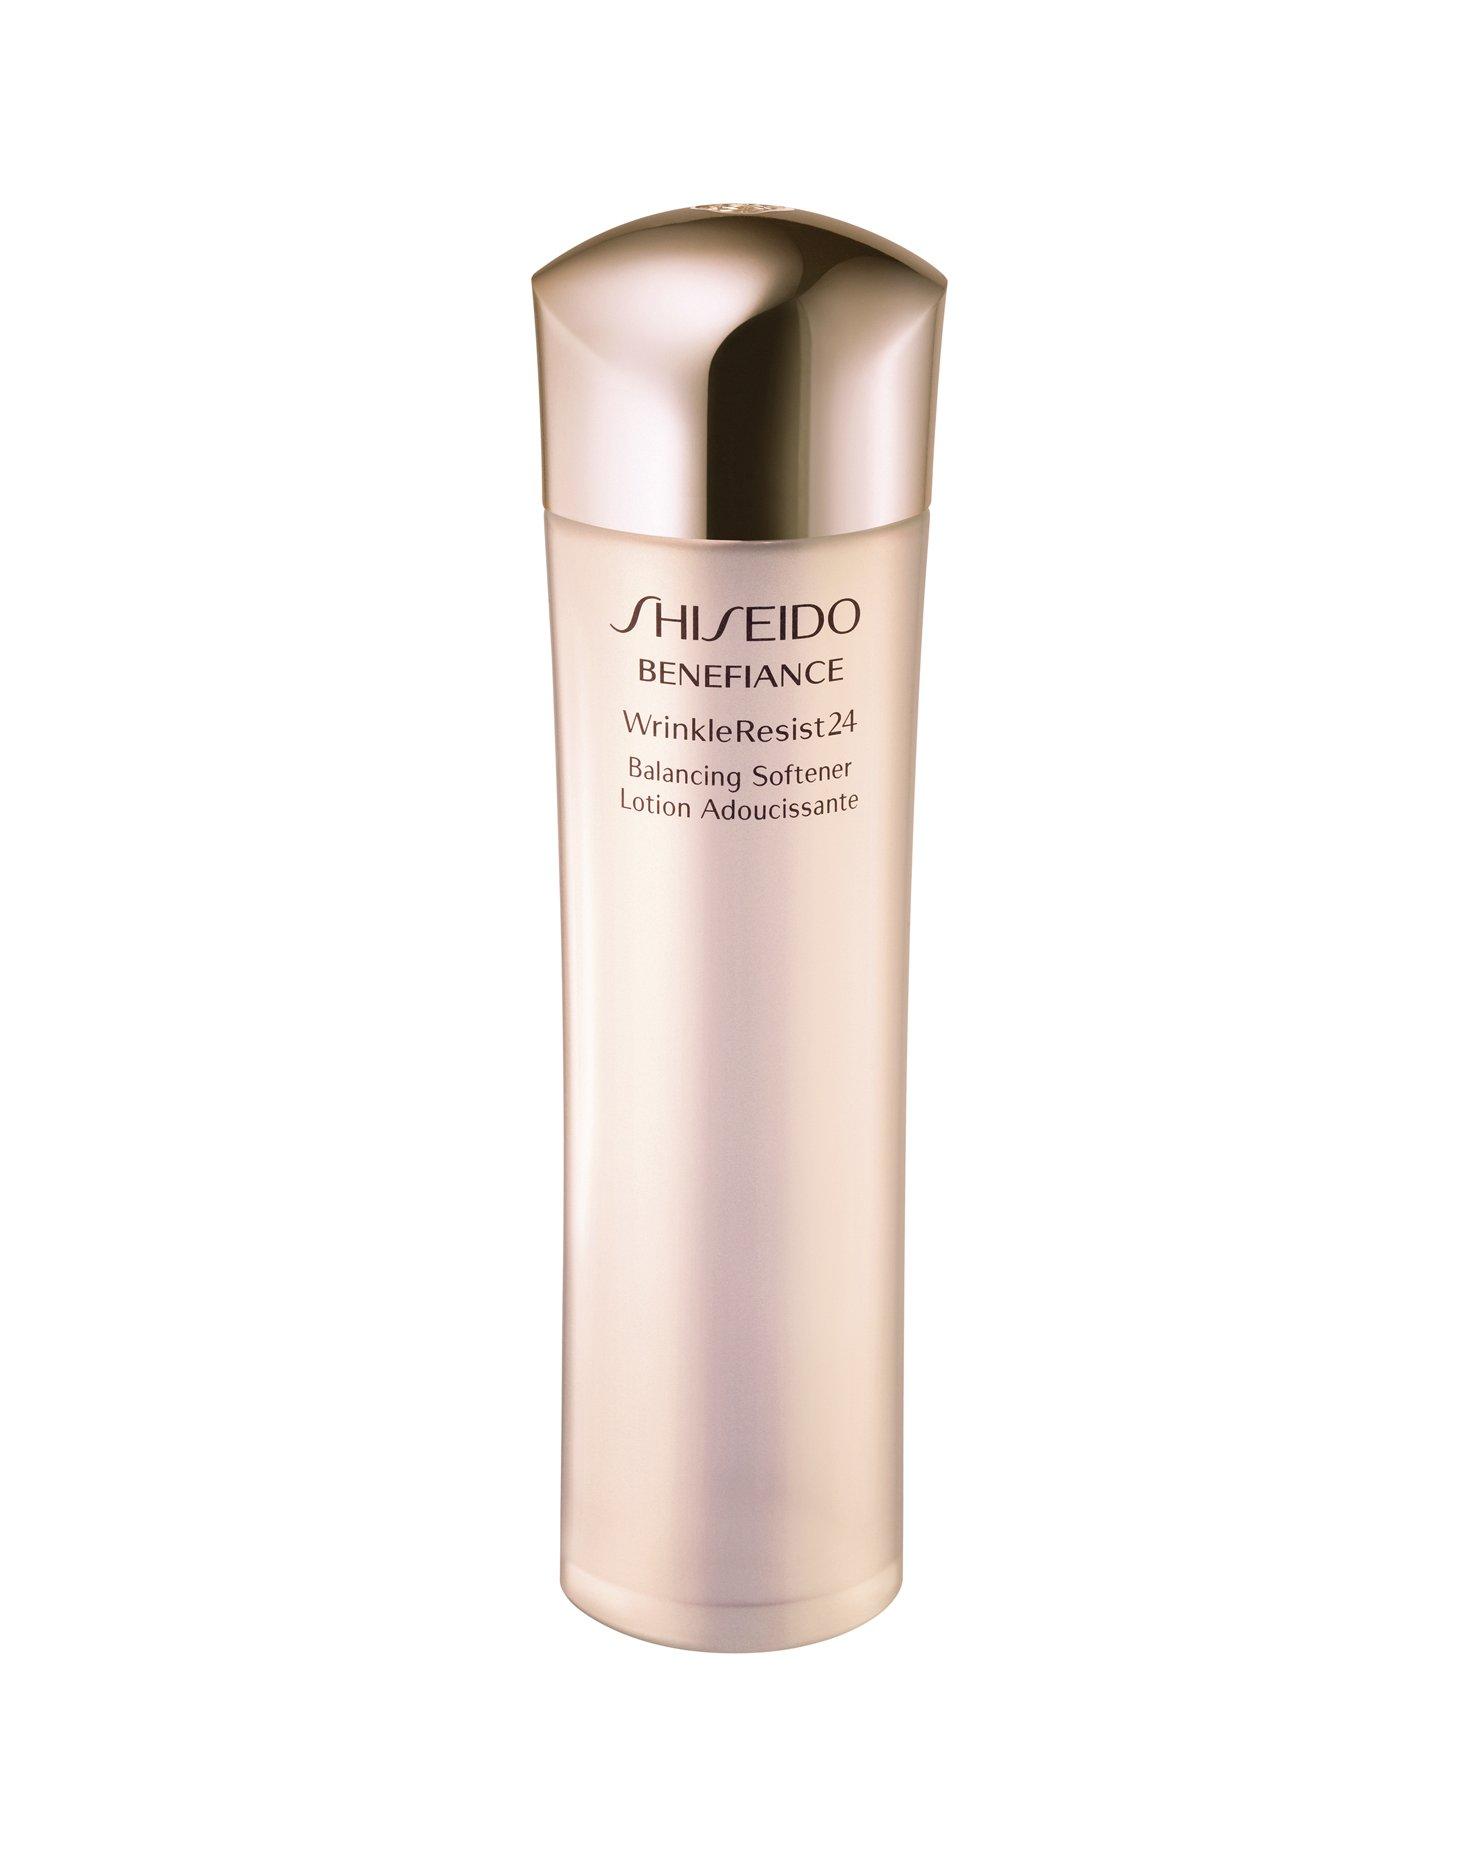 Shiseido Benefiance Wrinkleresist24 Balancing Softener for Unisex, 5 Ounce by Shiseido